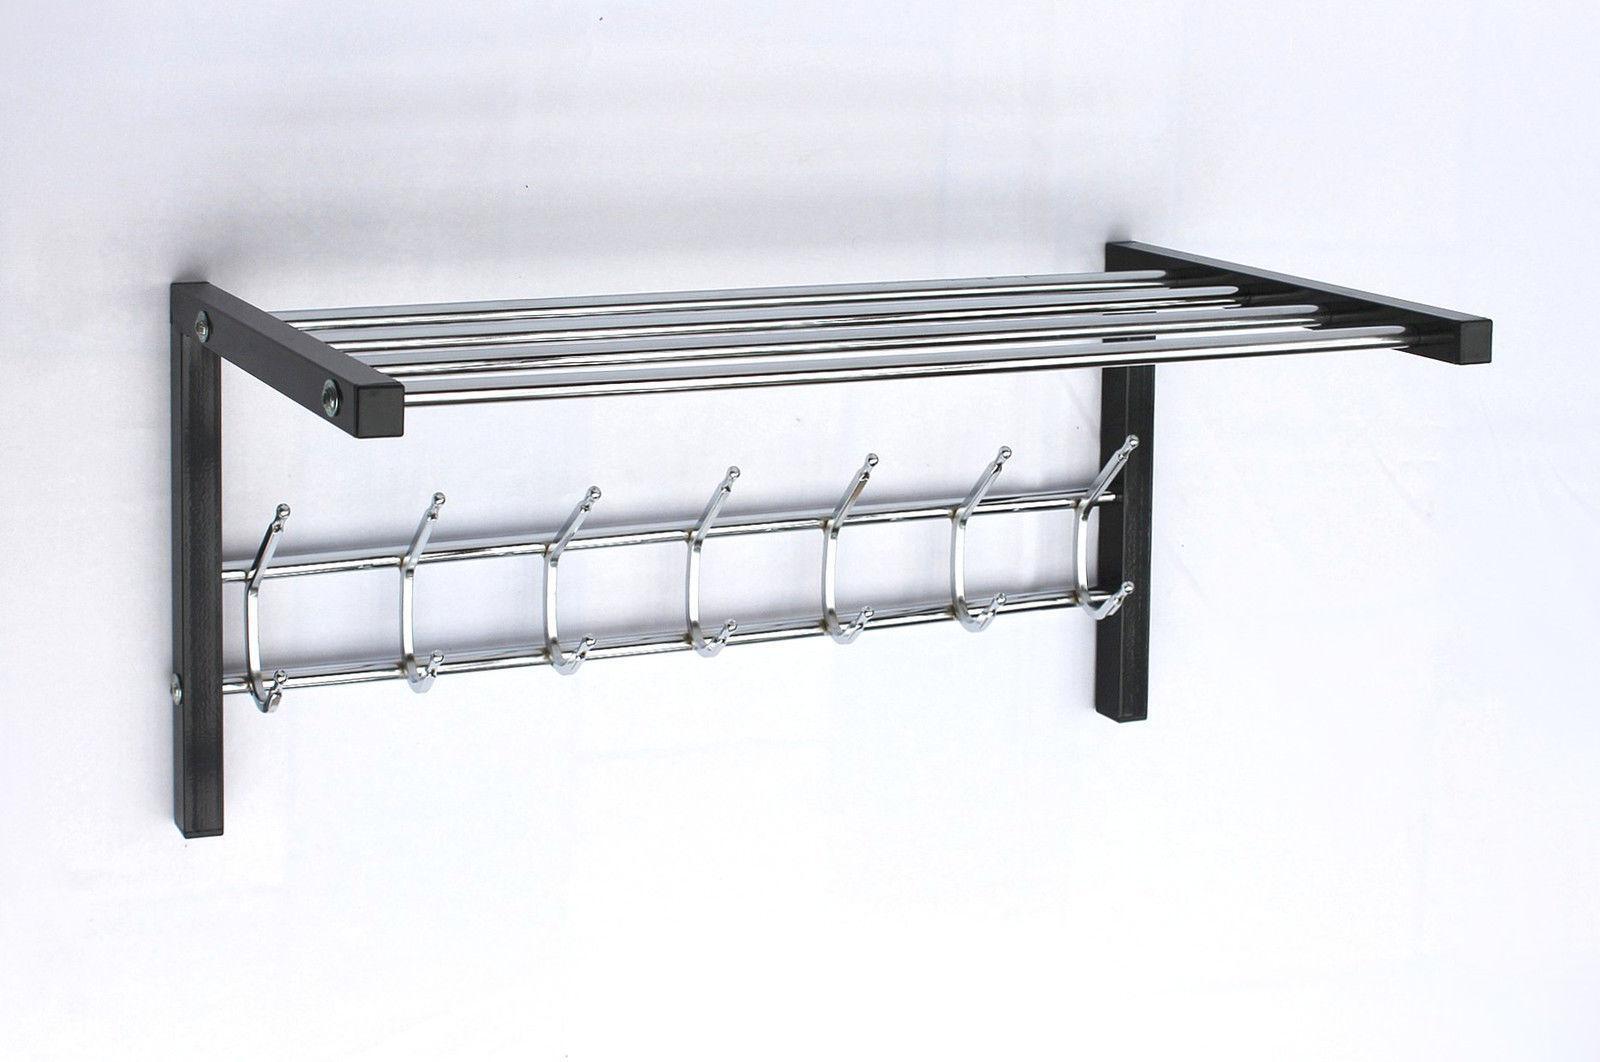 wandgarderobe mit hutablage garderobe 70 cm kleiderhaken wandregal haken eur 59 99. Black Bedroom Furniture Sets. Home Design Ideas